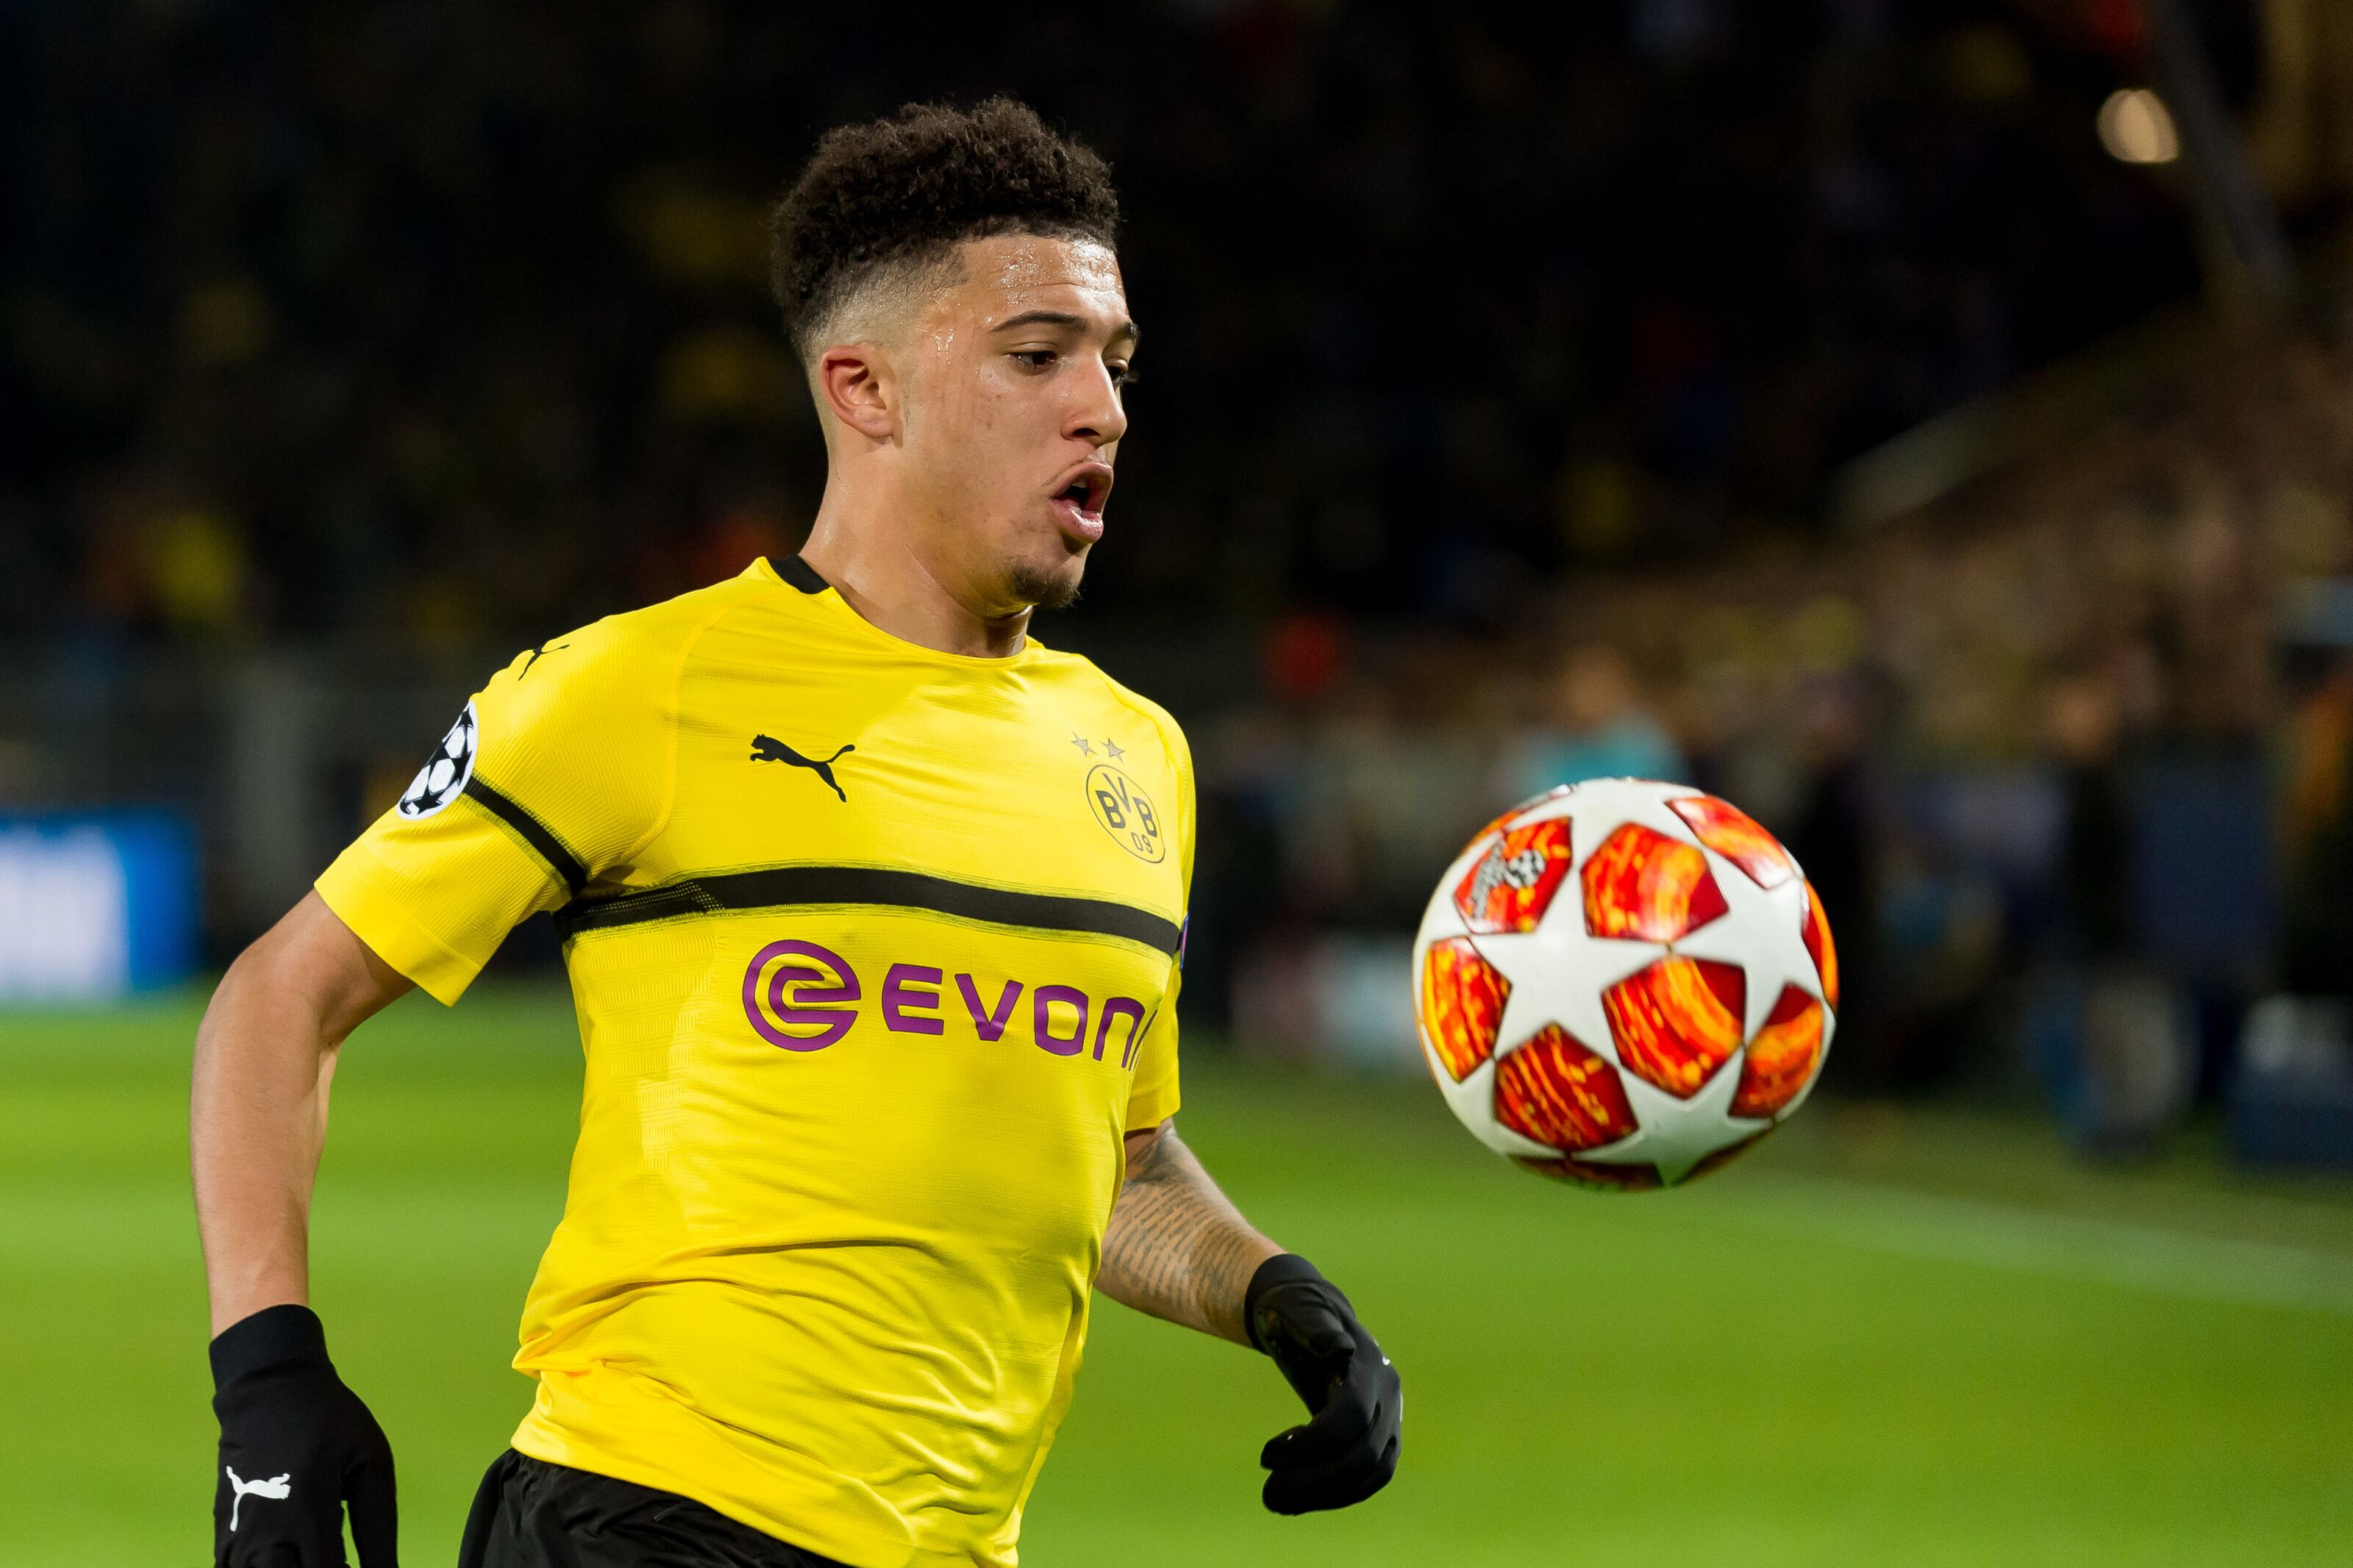 Michael Zorc: Jadon Sancho will play for Borussia Dortmund next season